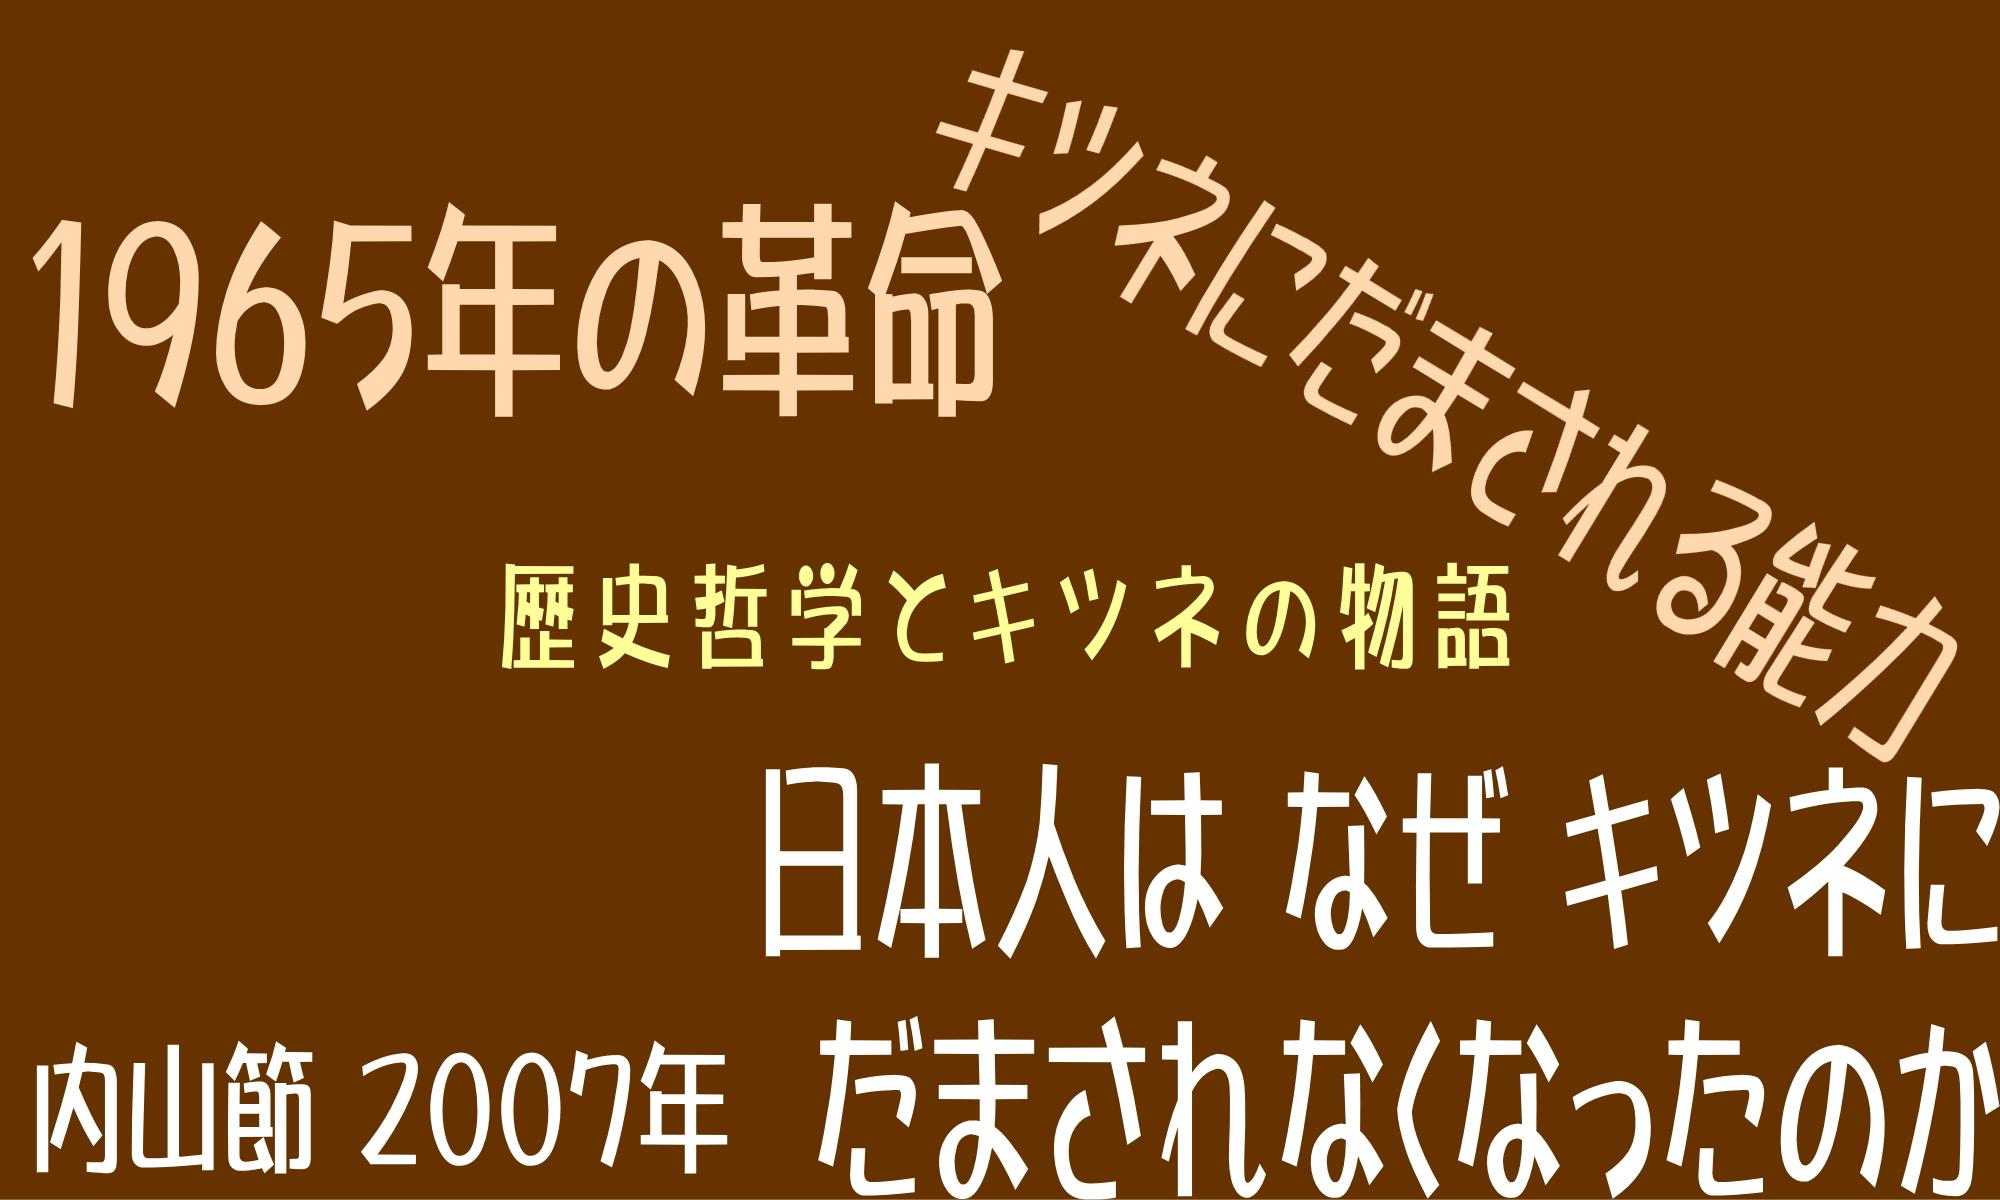 YAMADA,Toshiyuki